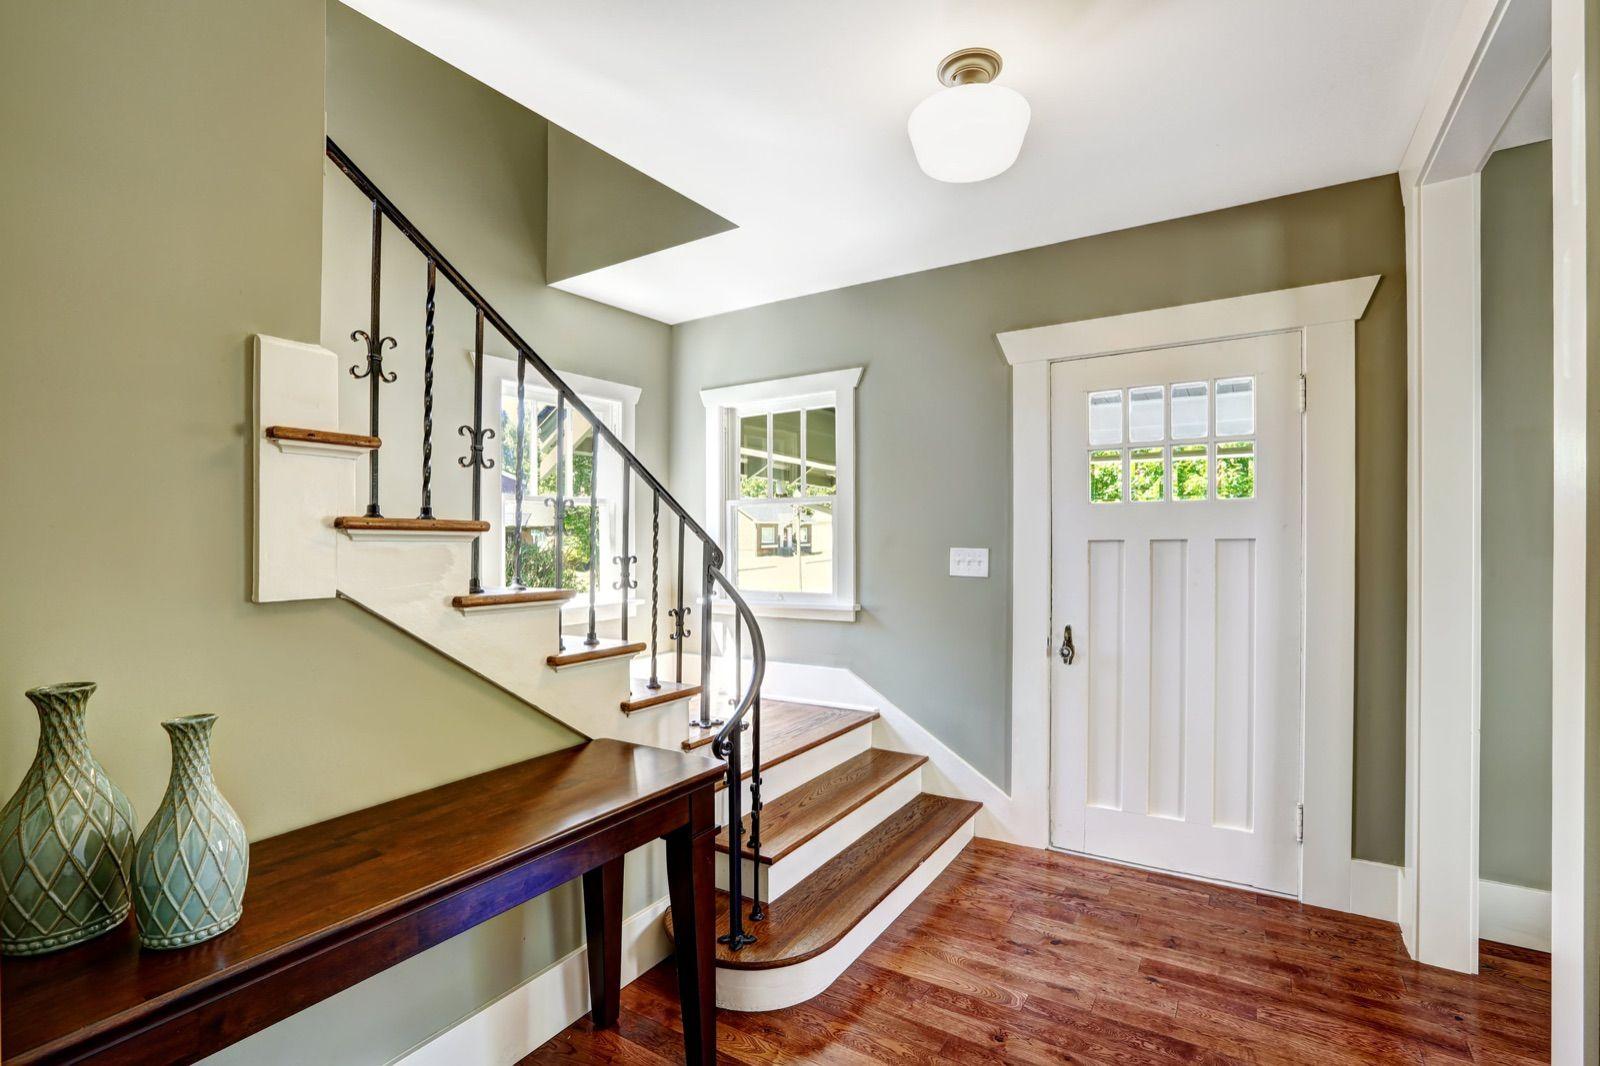 Drvena, PVC ulazna vrata ili ALU ulazna vrata?